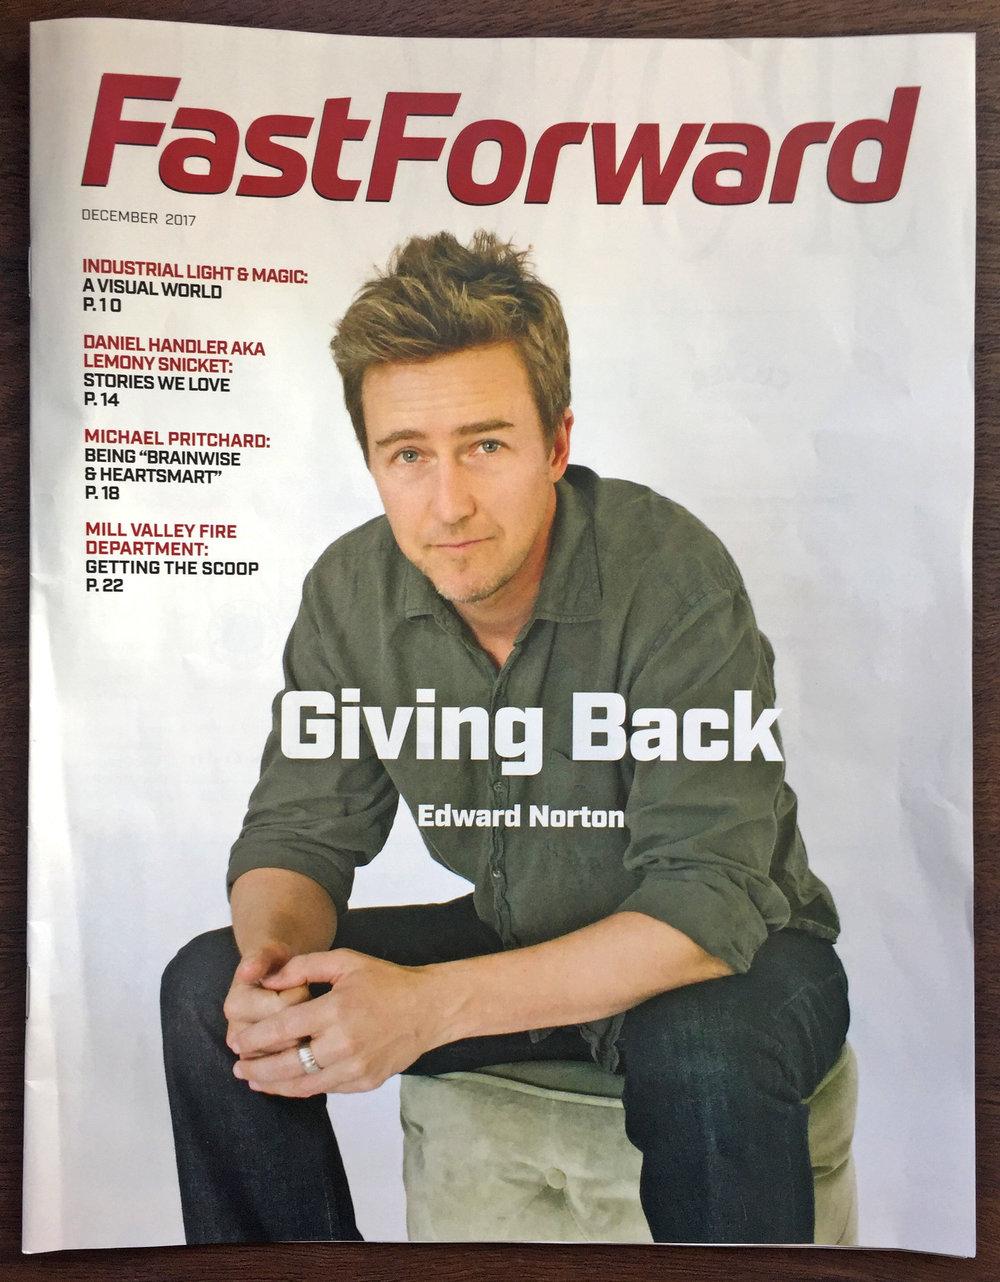 FastForward_Cover_IMG_5871.jpg